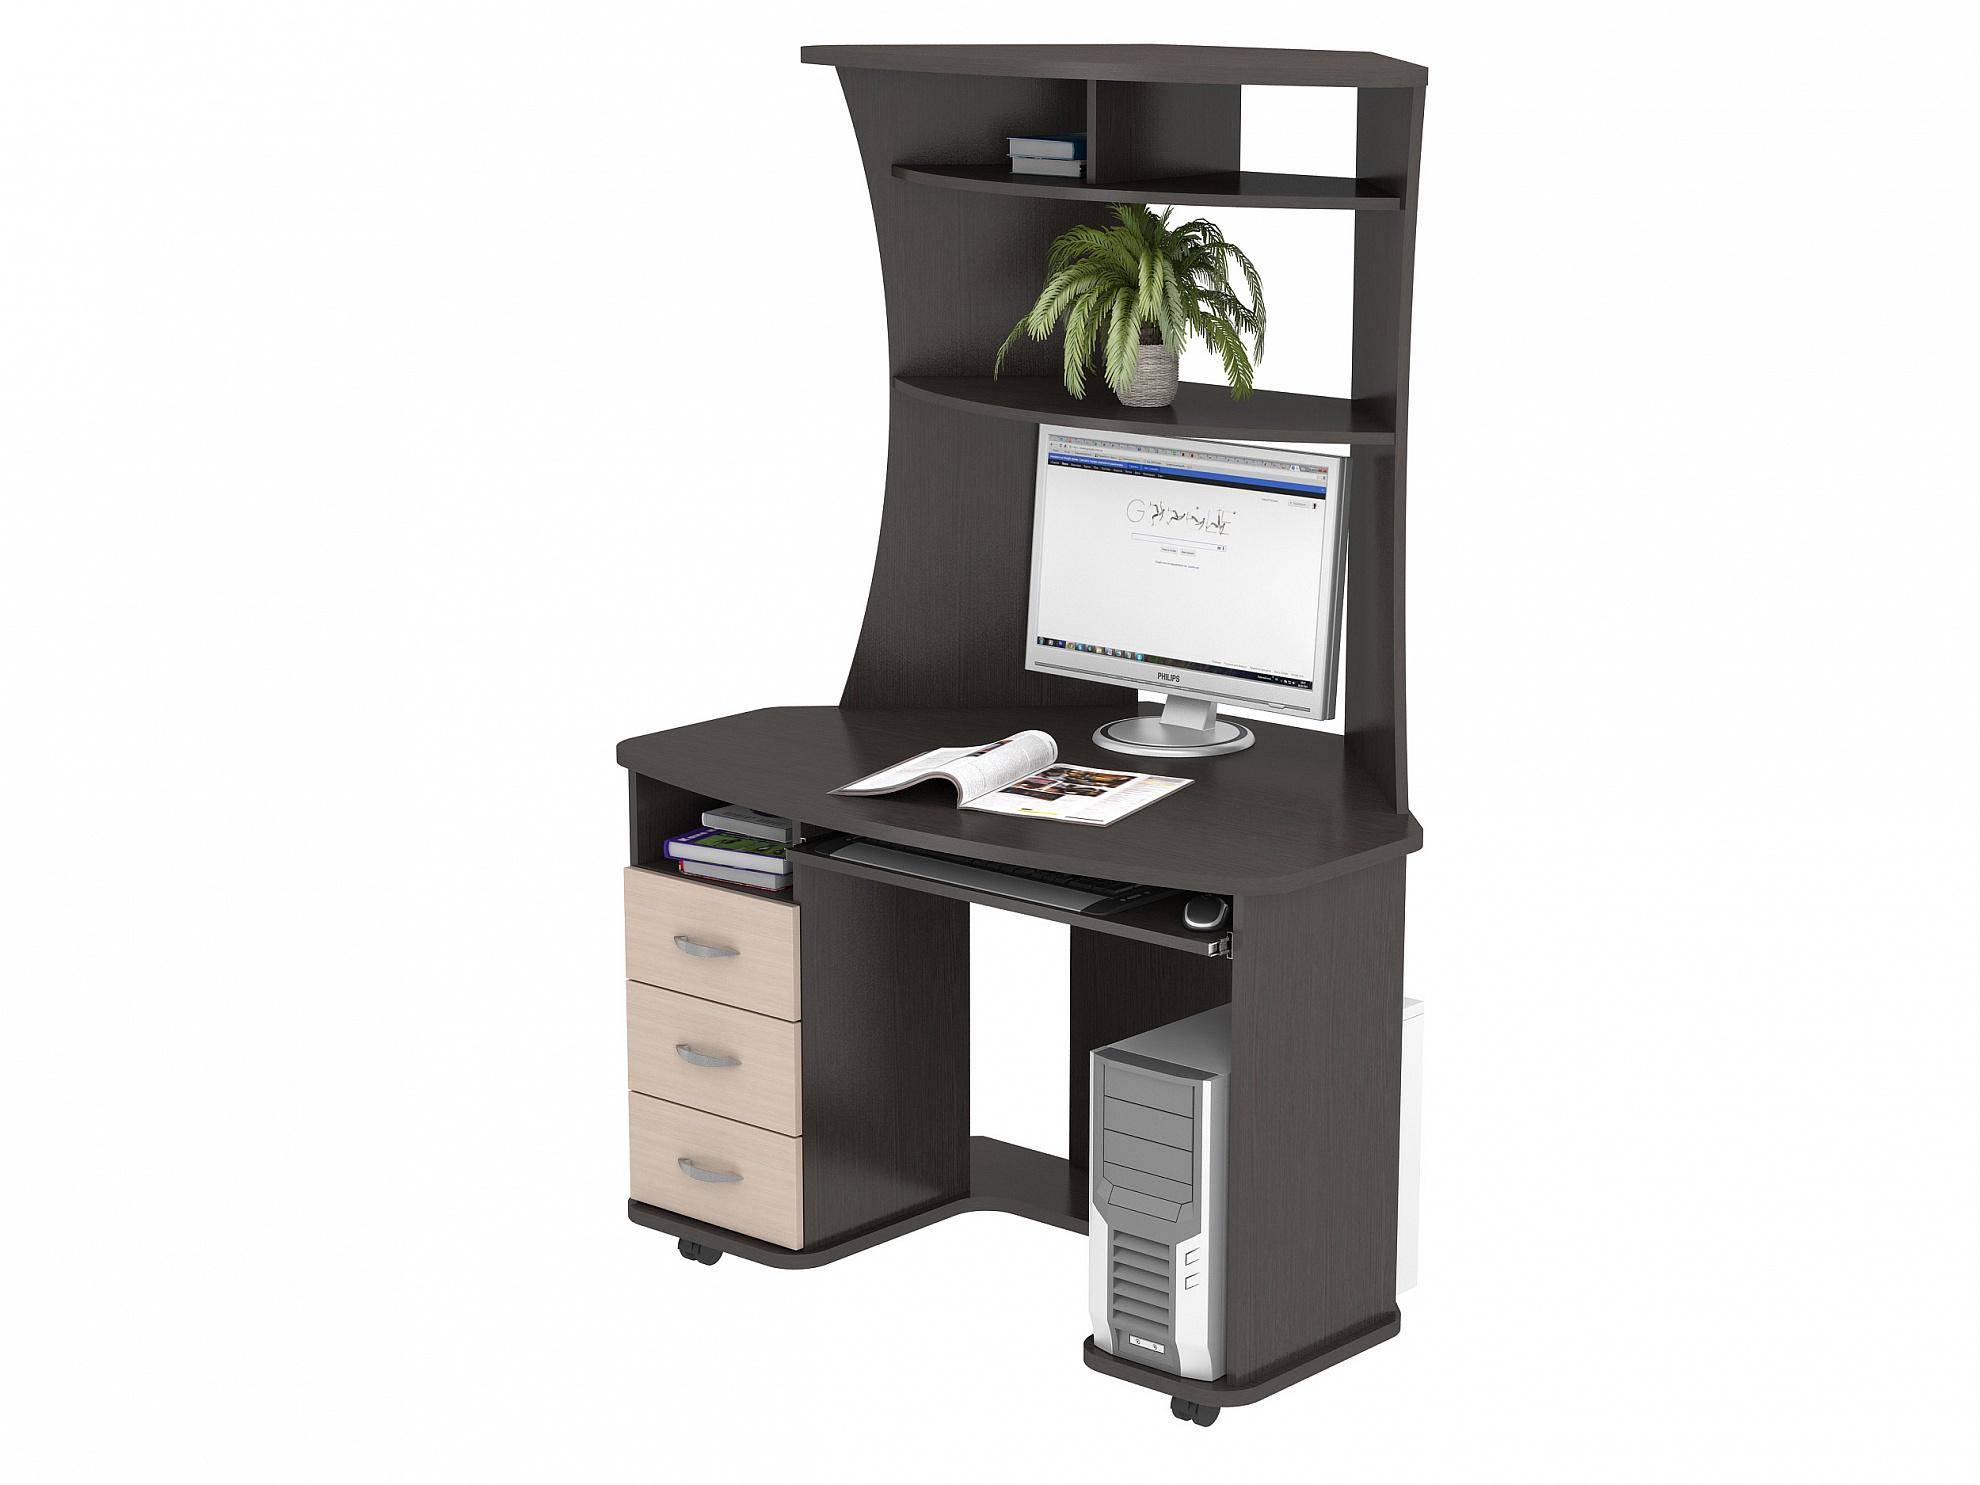 Компьютерный стол КС 20-26 компьютерный стол кс 20 16м3